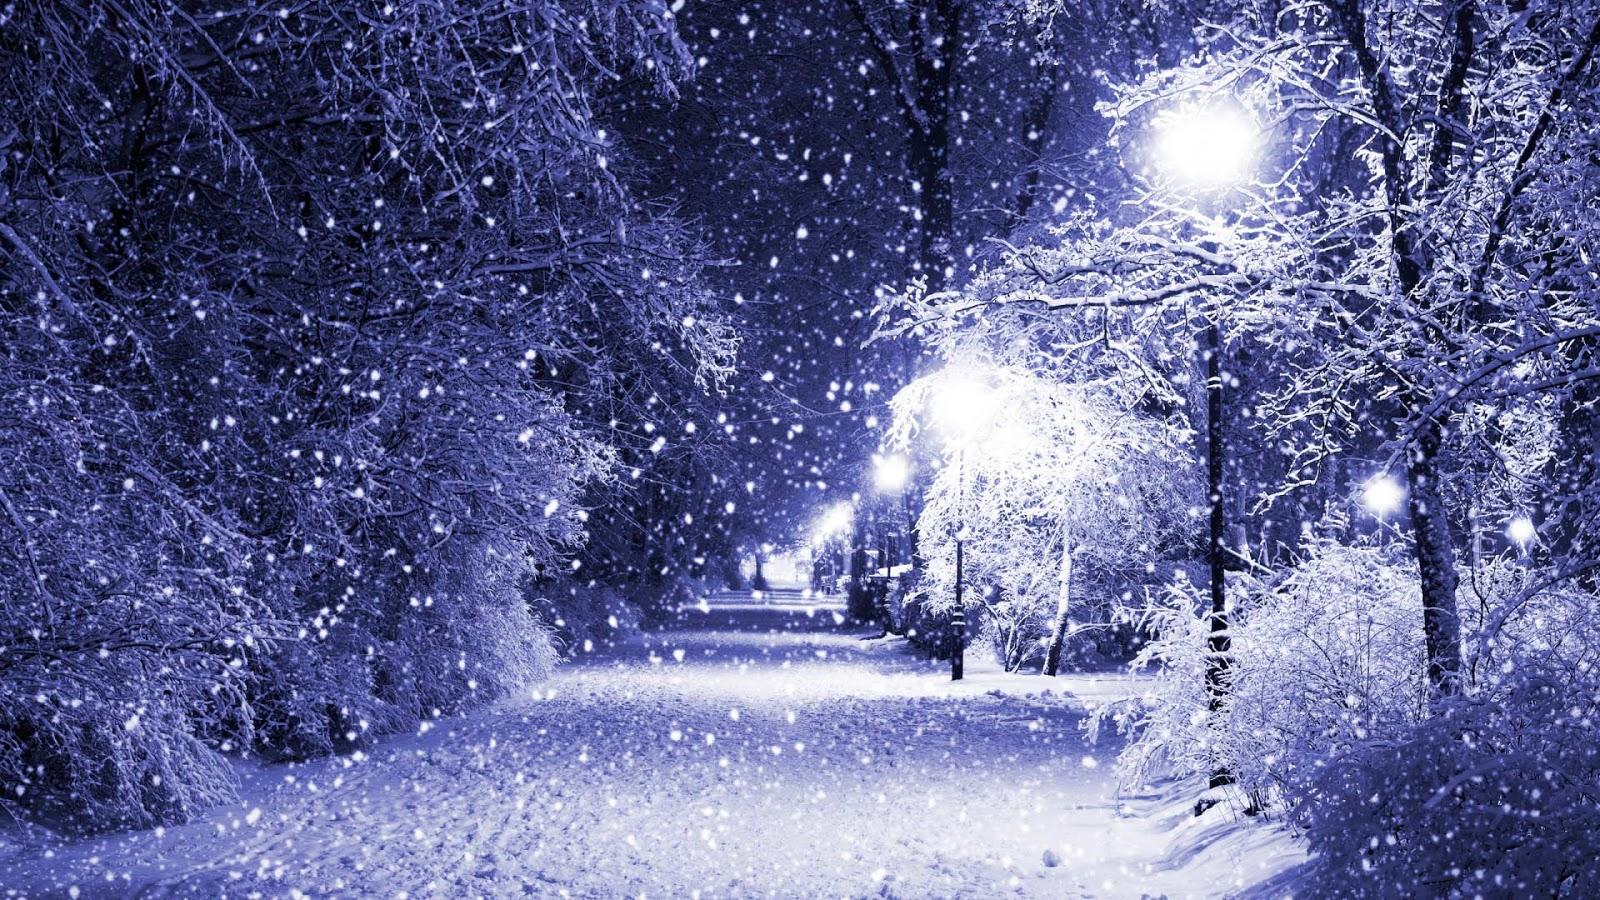 Falling Snow Wallpaper Animated Iphone ⇜Зимние леса Winter Forest⇜ Красивые картинки обои и